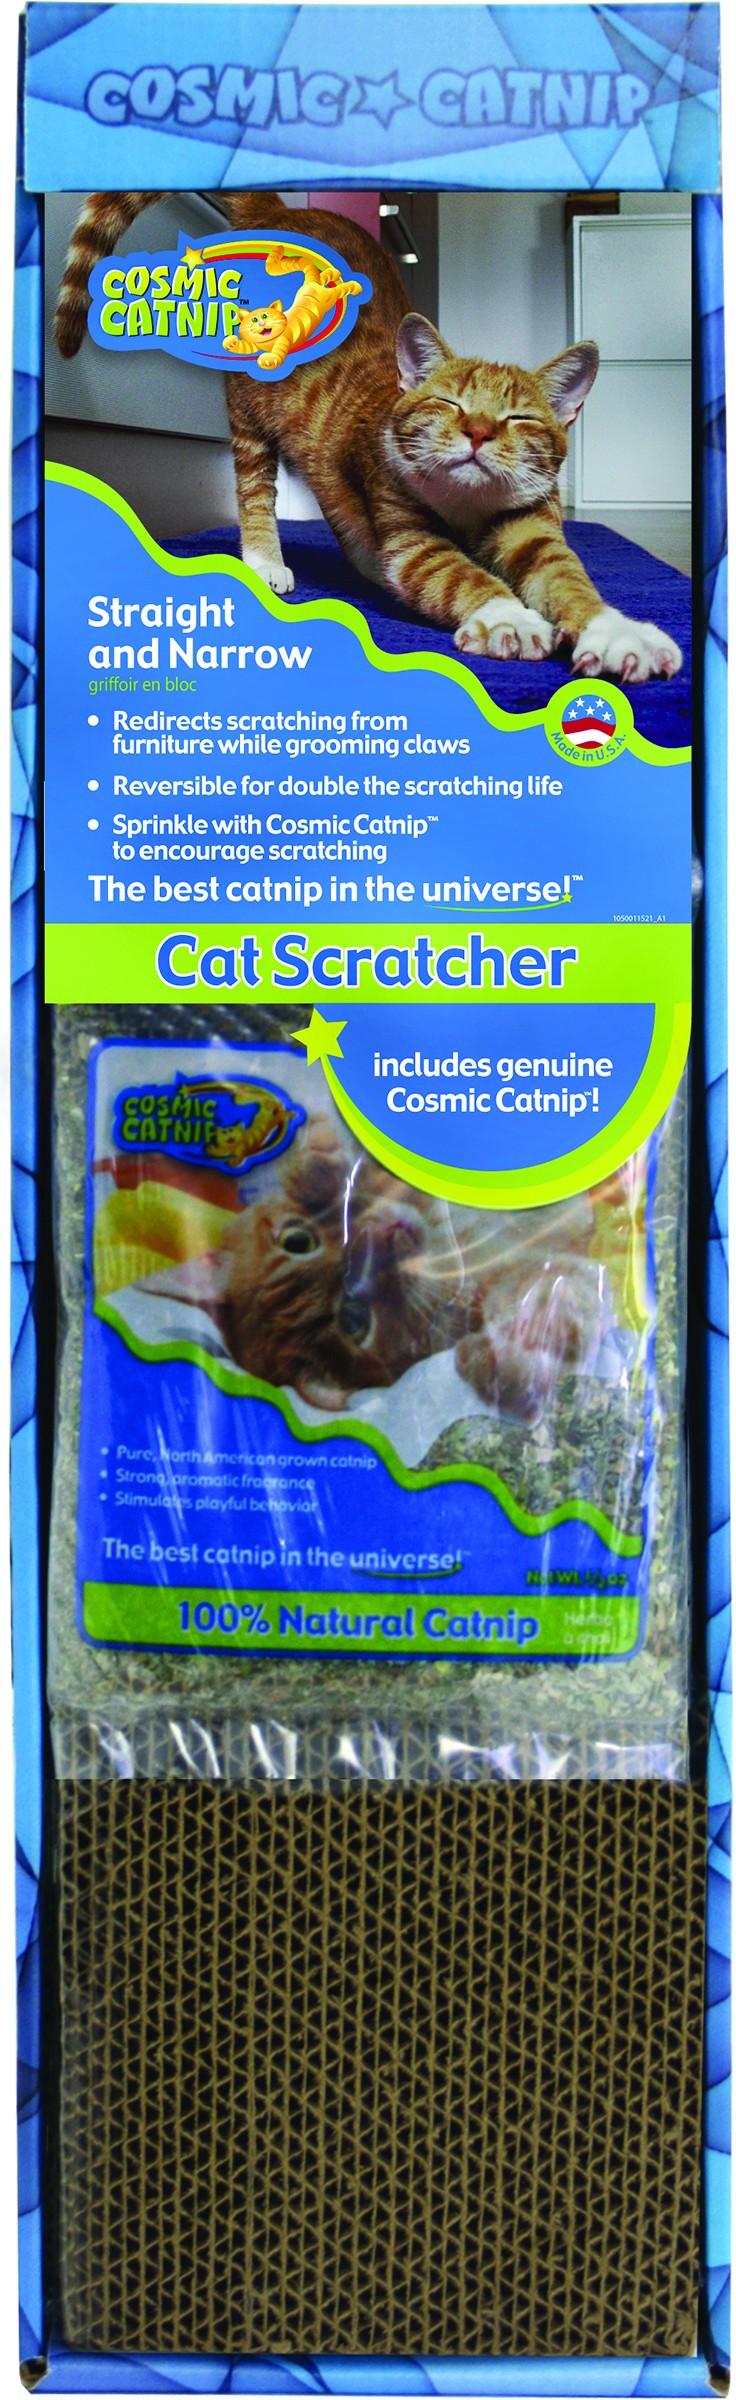 COSMIC STRAIGHT & NARROW CAT SCRATCHER